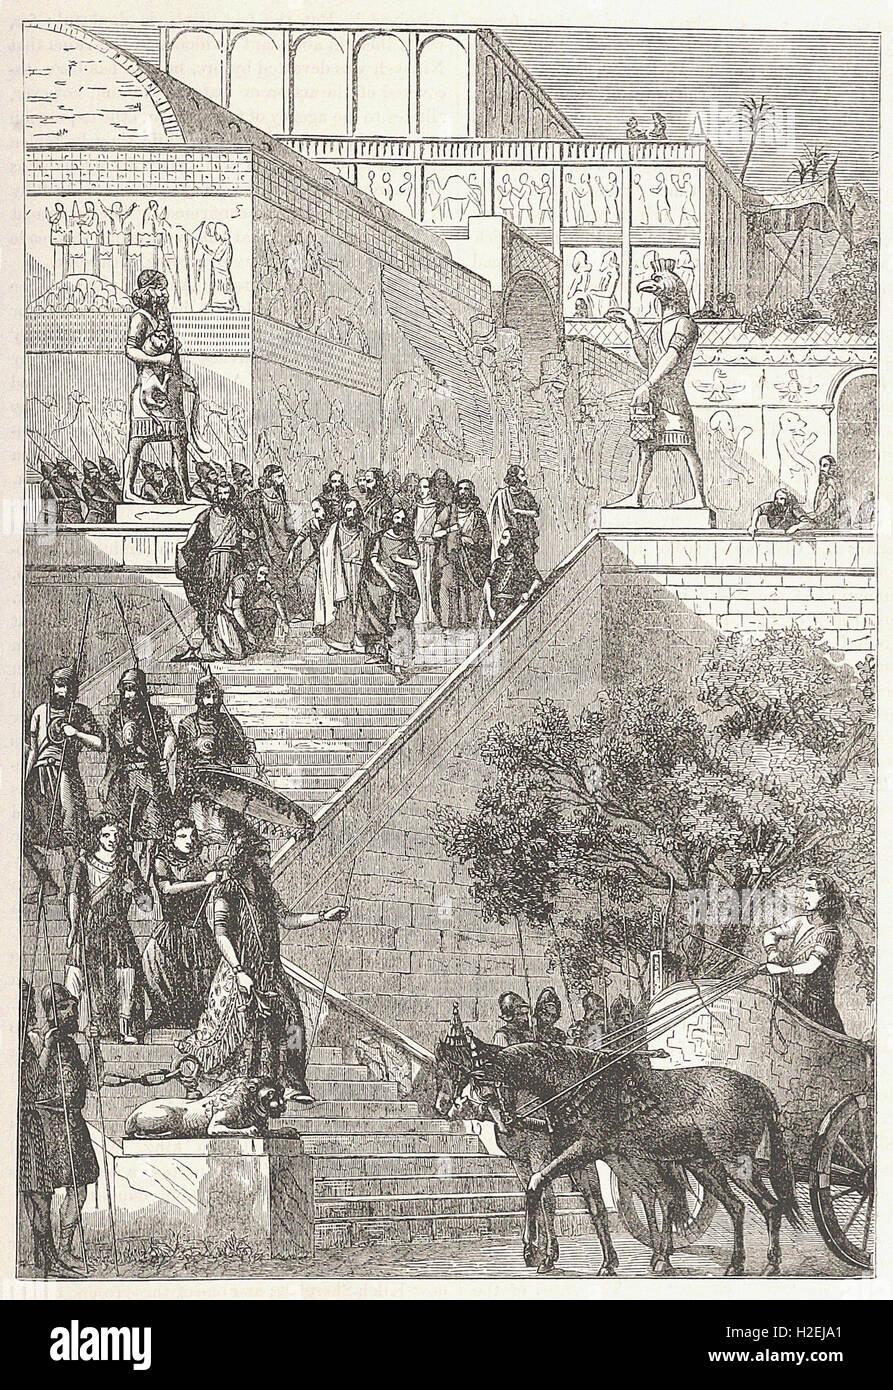 TIIE PALACE OF KOUYUNJIK, RESTORED - from 'Cassell's Illustrated Universal History' - 1882 - Stock Image